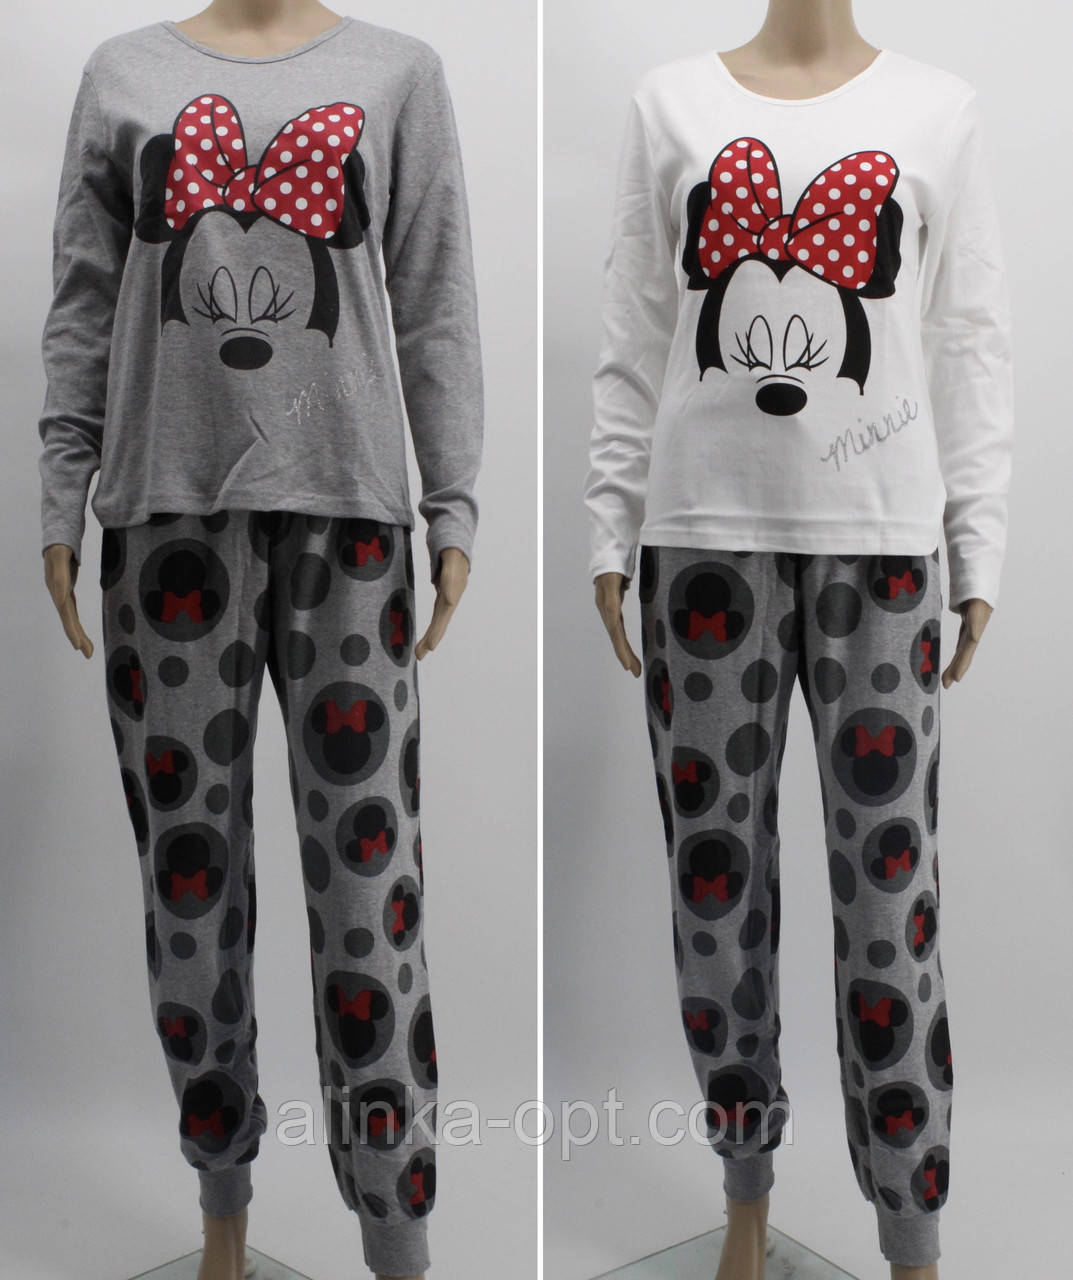 Пижама женская Disney оптом, S-XL рр. Артикул: MIN-G-PYJAMAS-525